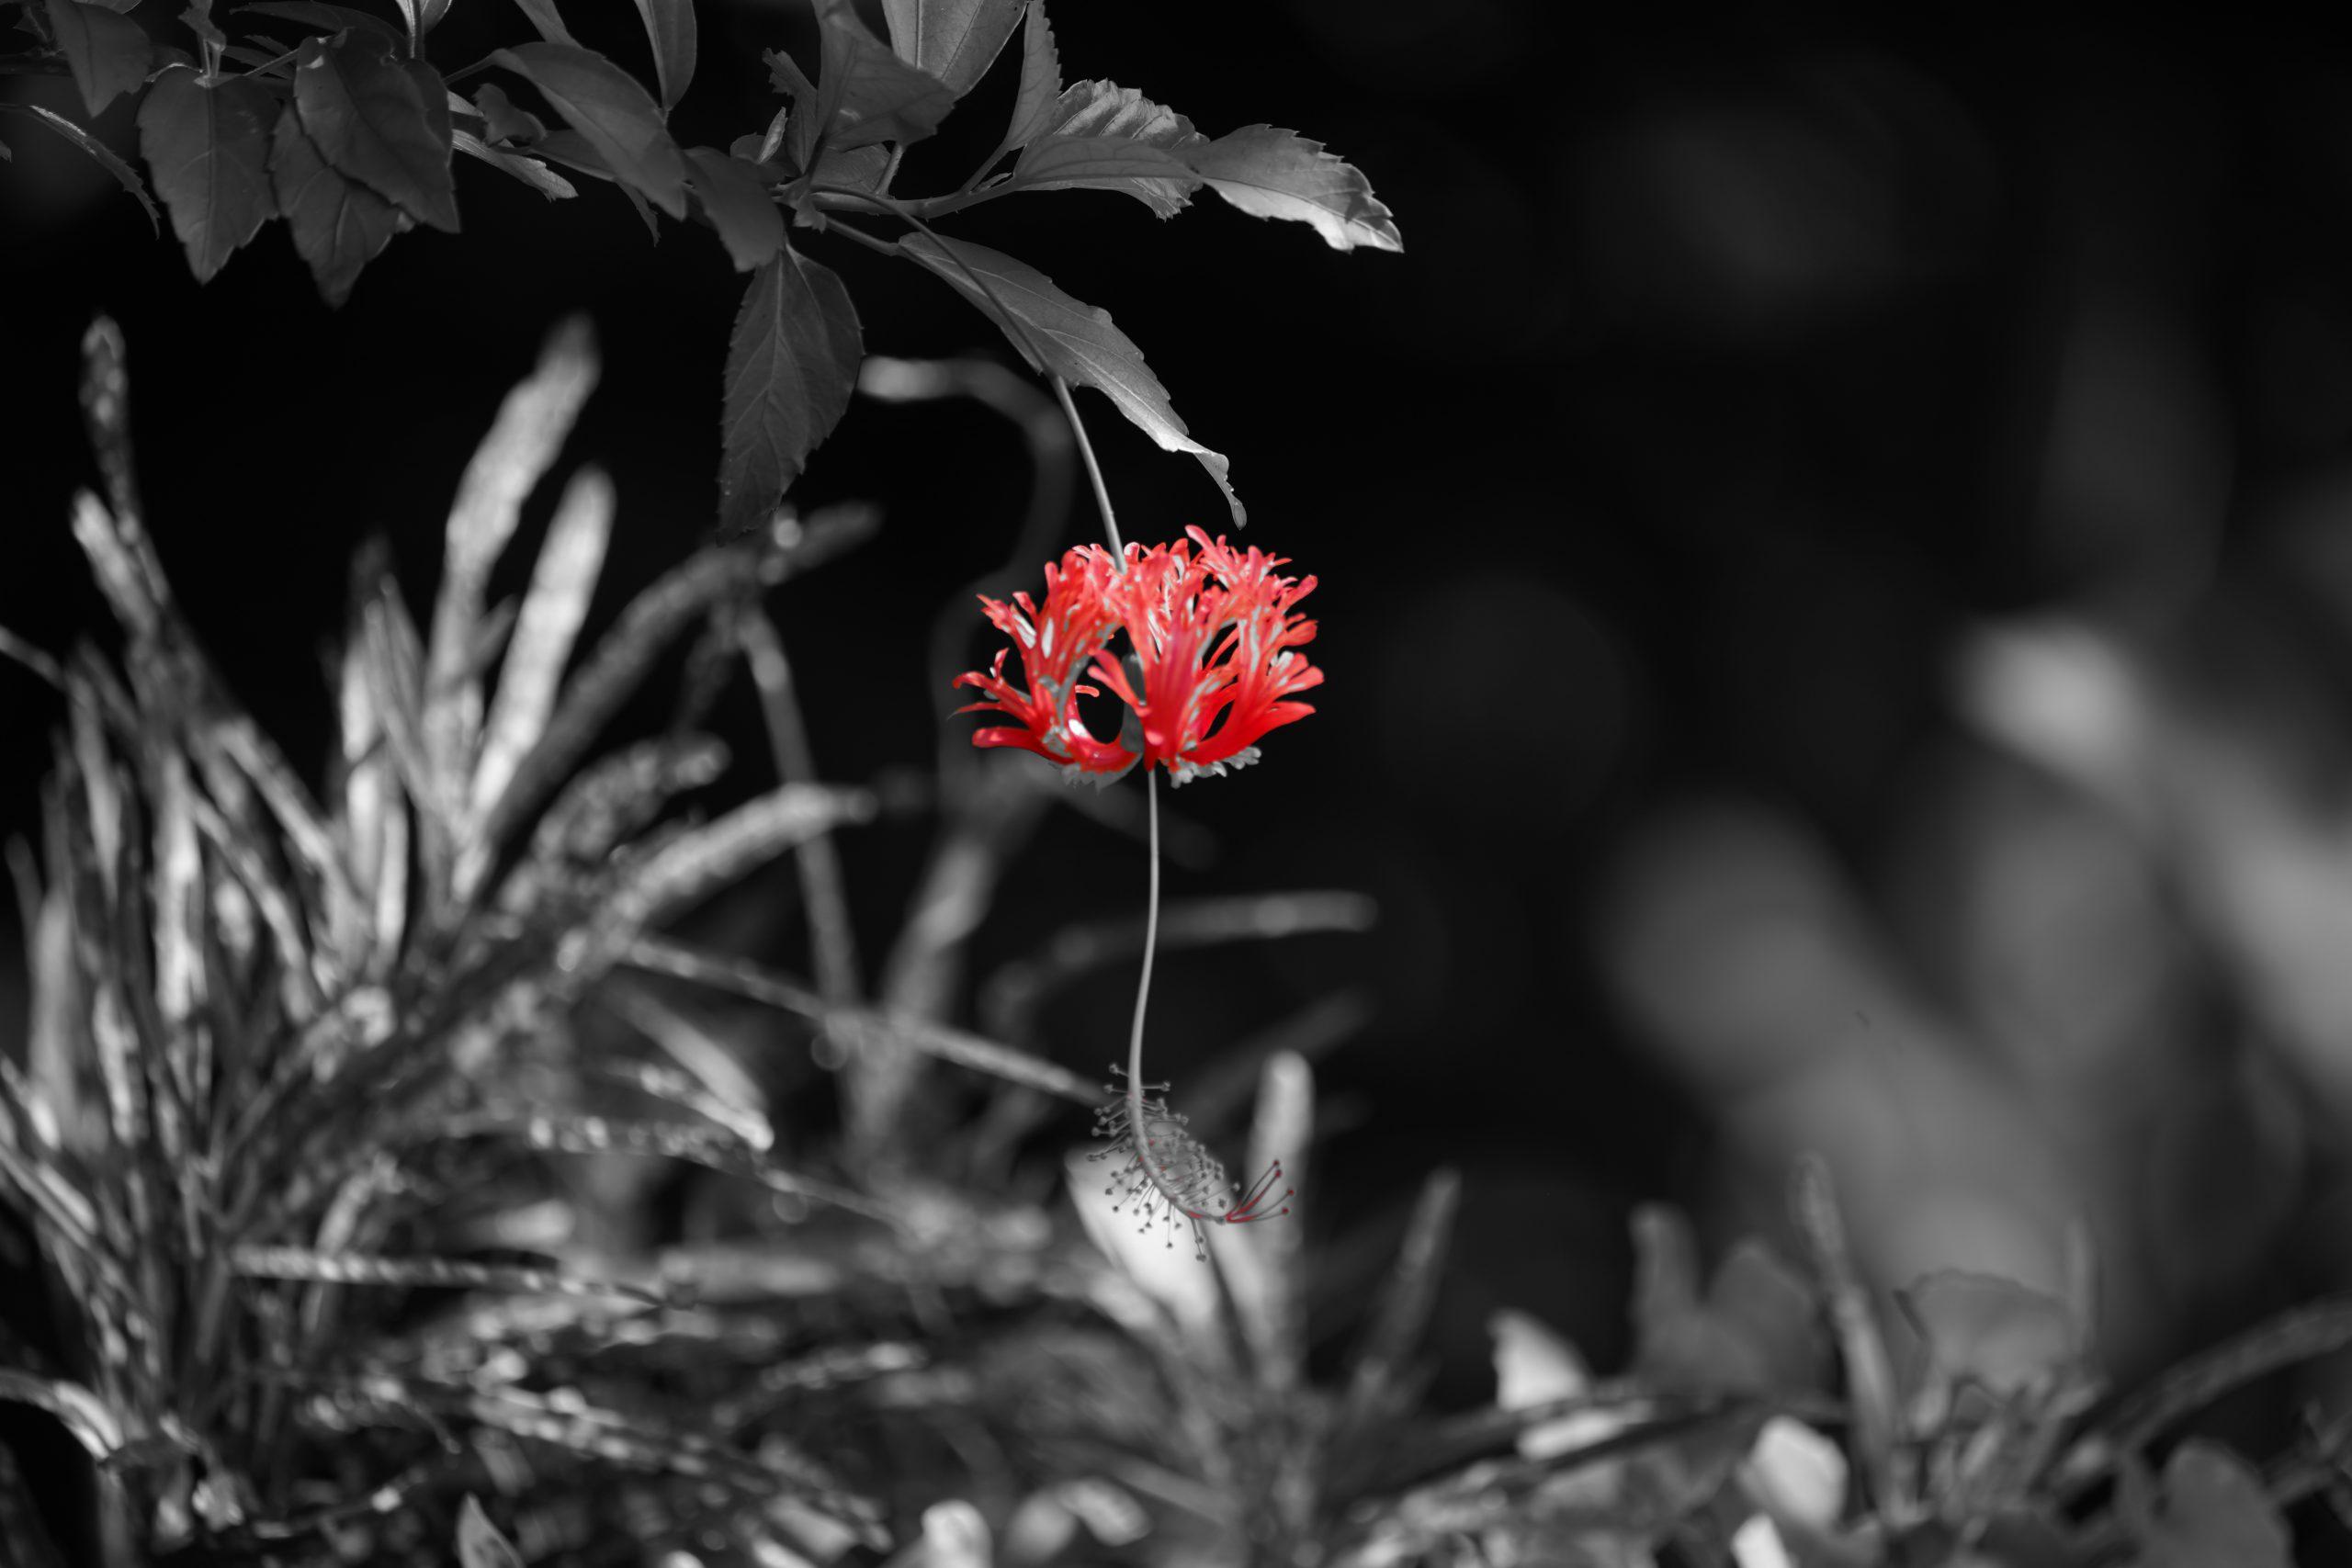 Blooming Red Flower